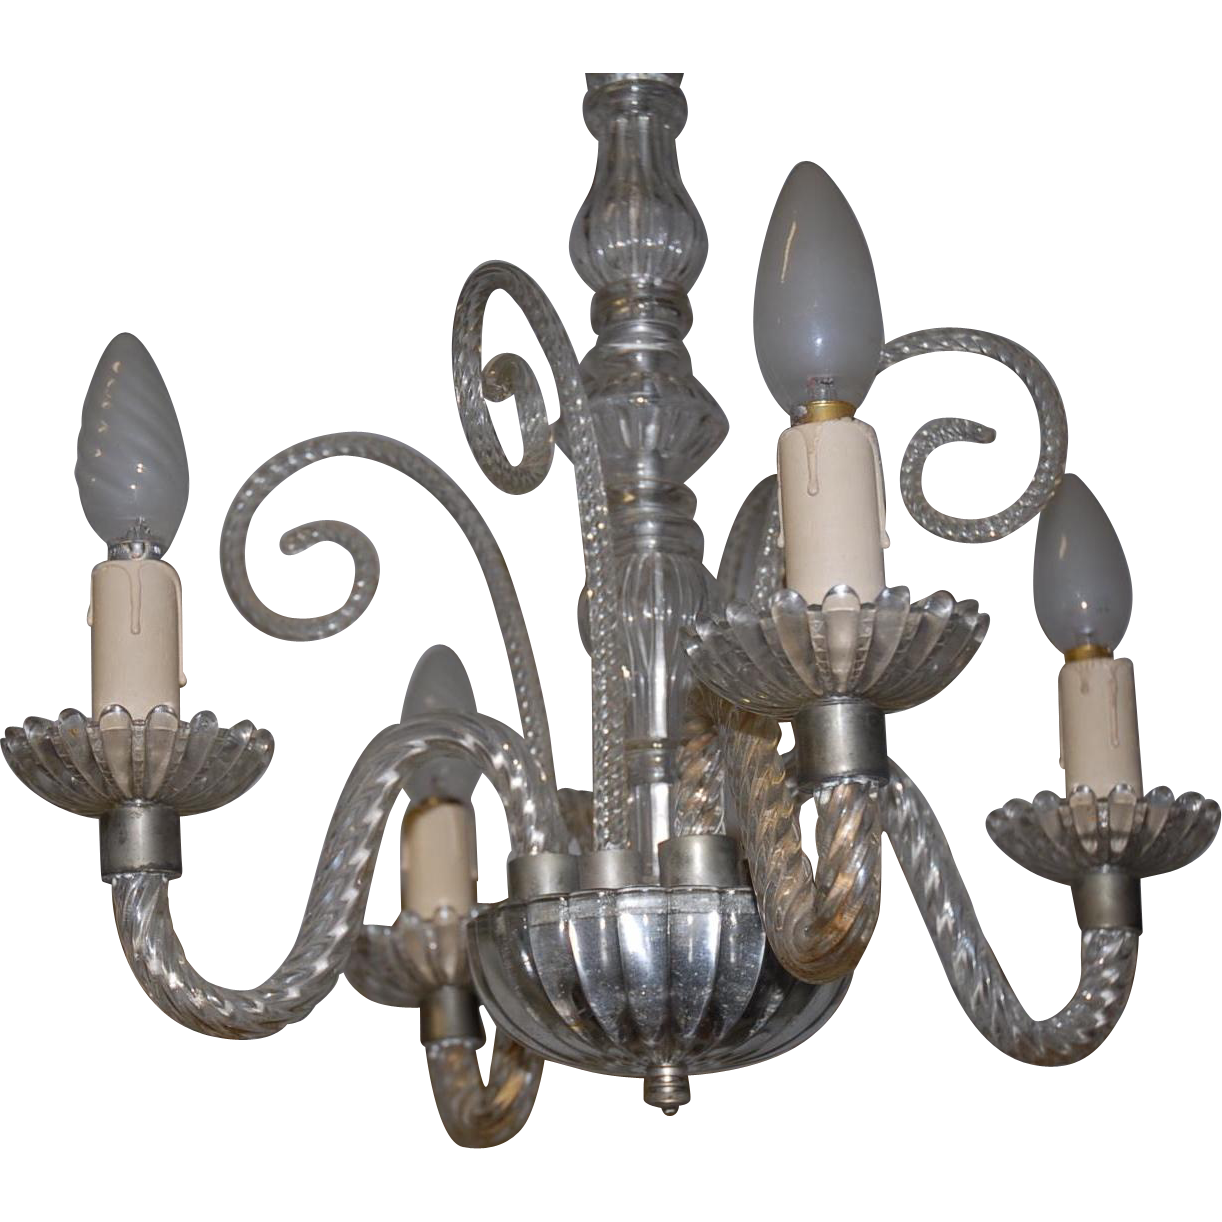 Antique 4 light Glass Chandelier